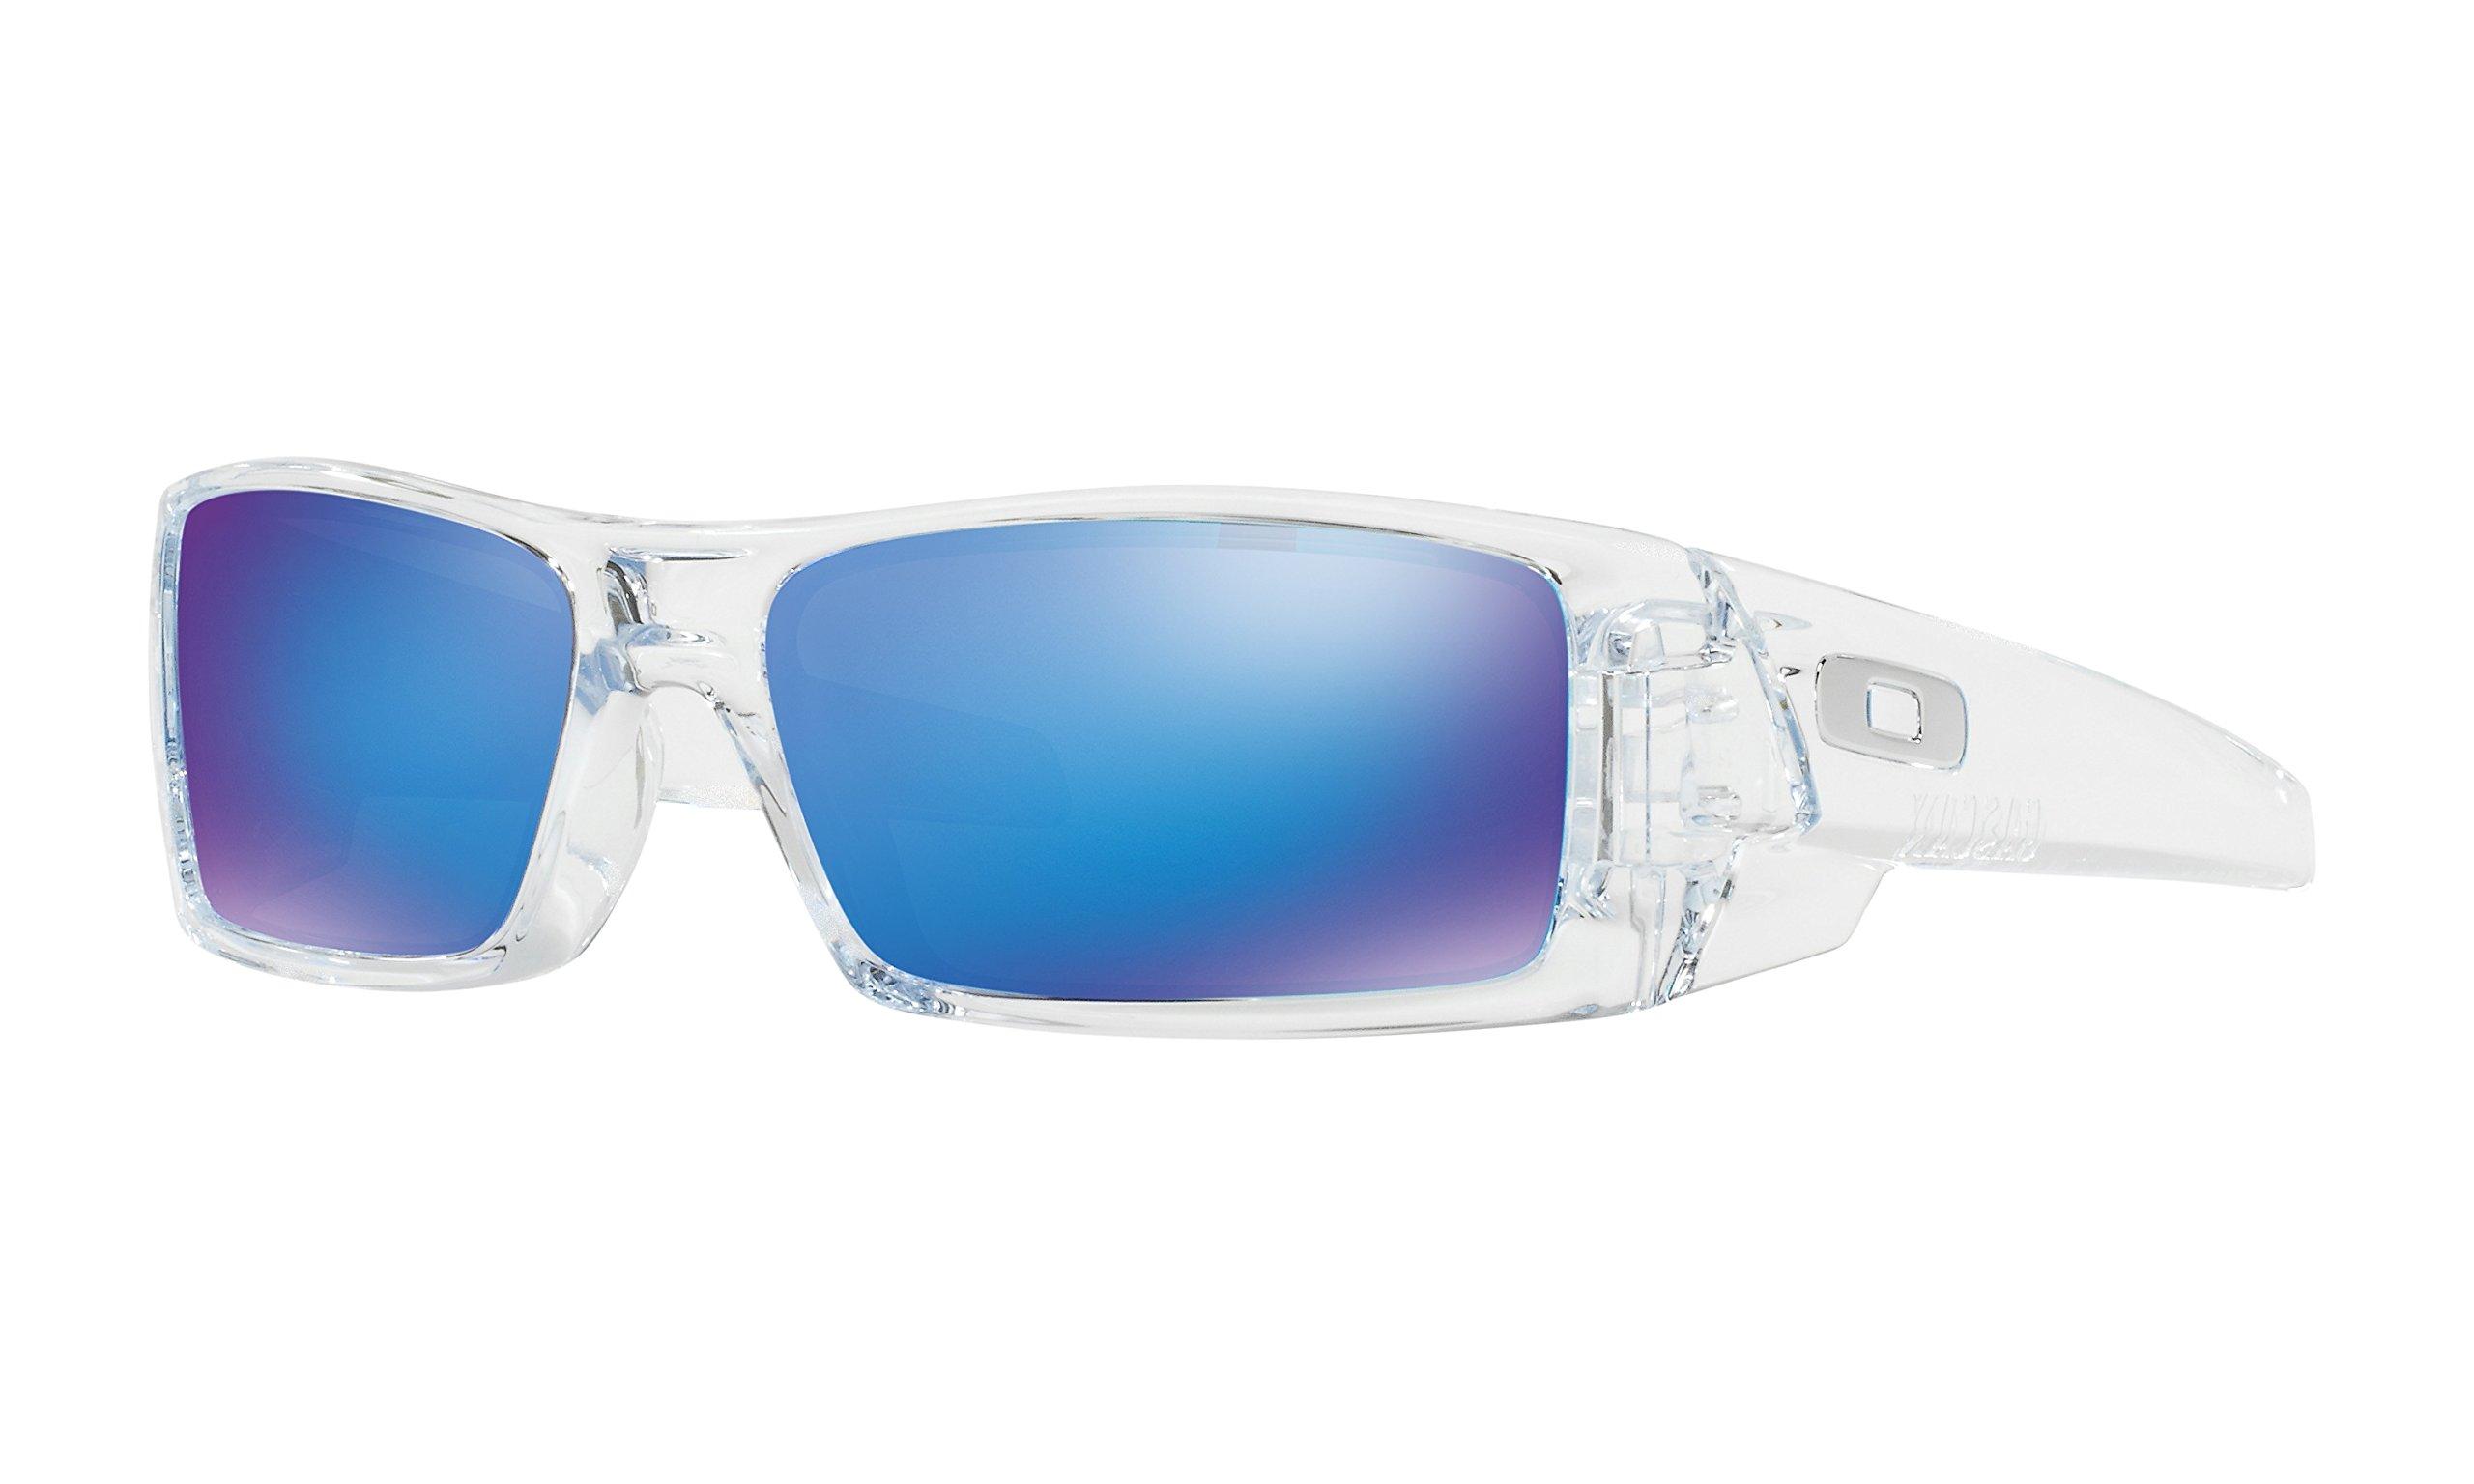 Oakley Men's Gascan Rectangular Sunglasses Polished Clear/Sapphire Iridium, 60 mm by Oakley